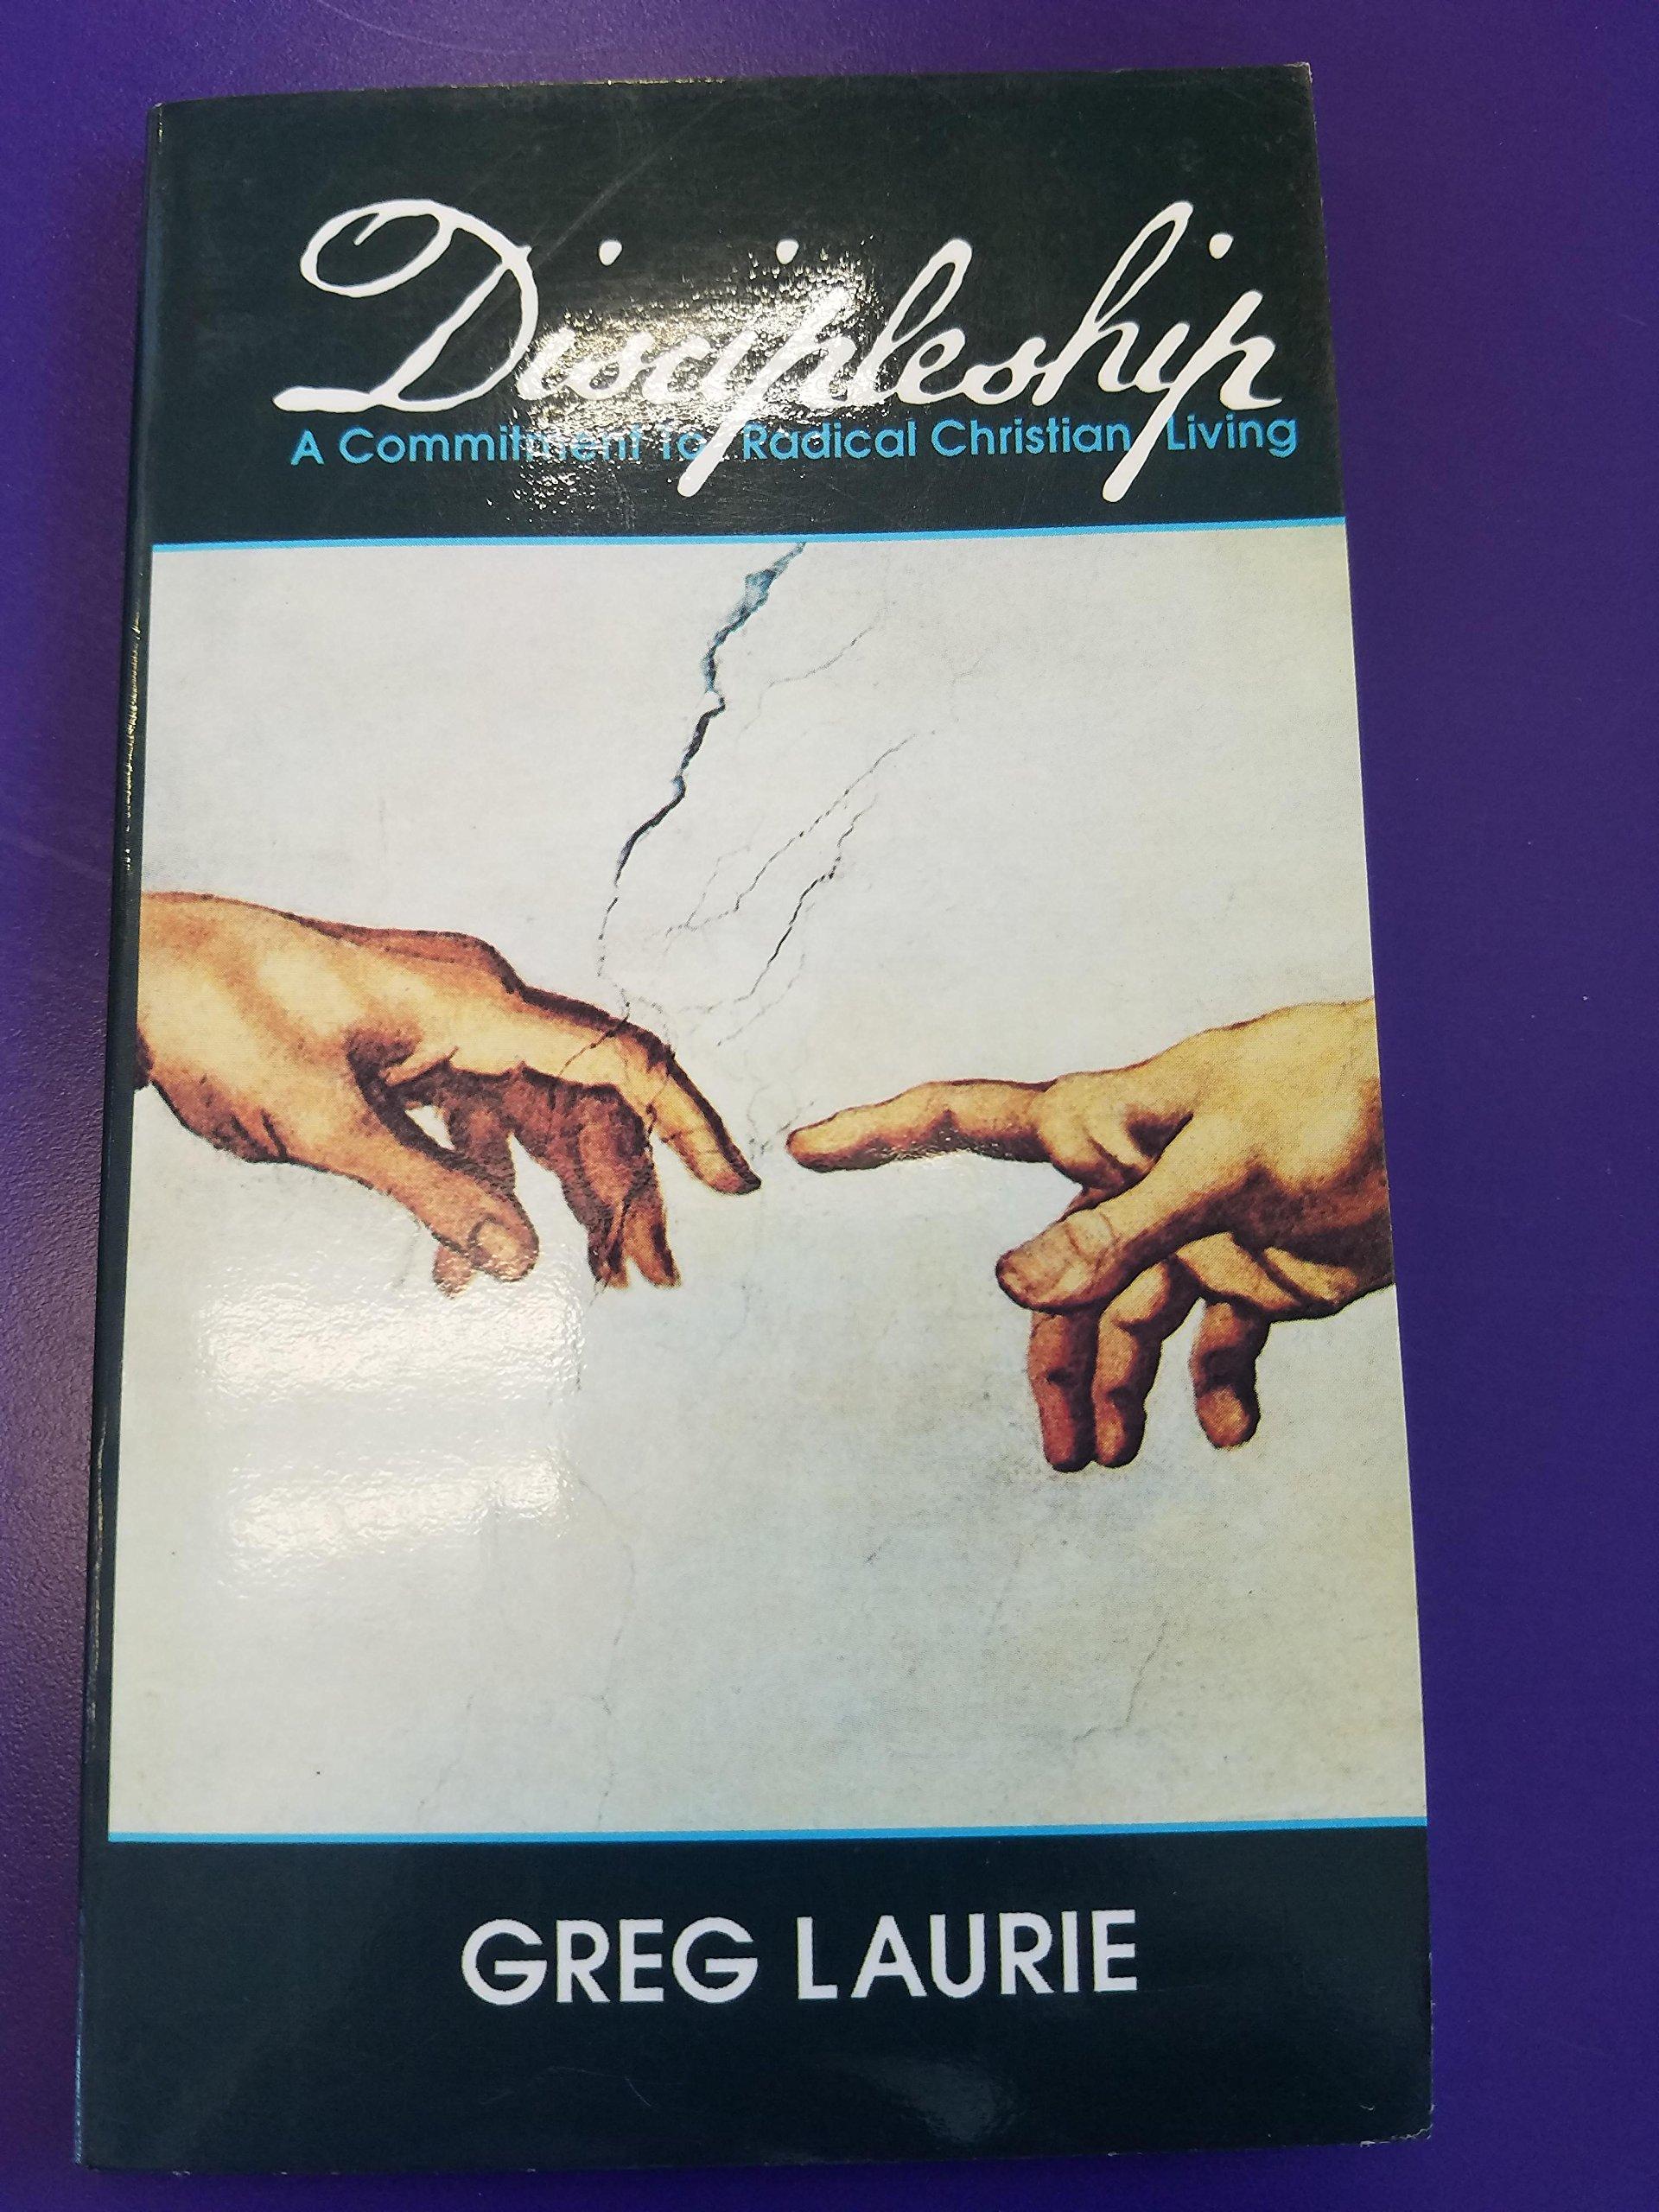 Discipleship: A Commitment to Radical Christian Living: Greg